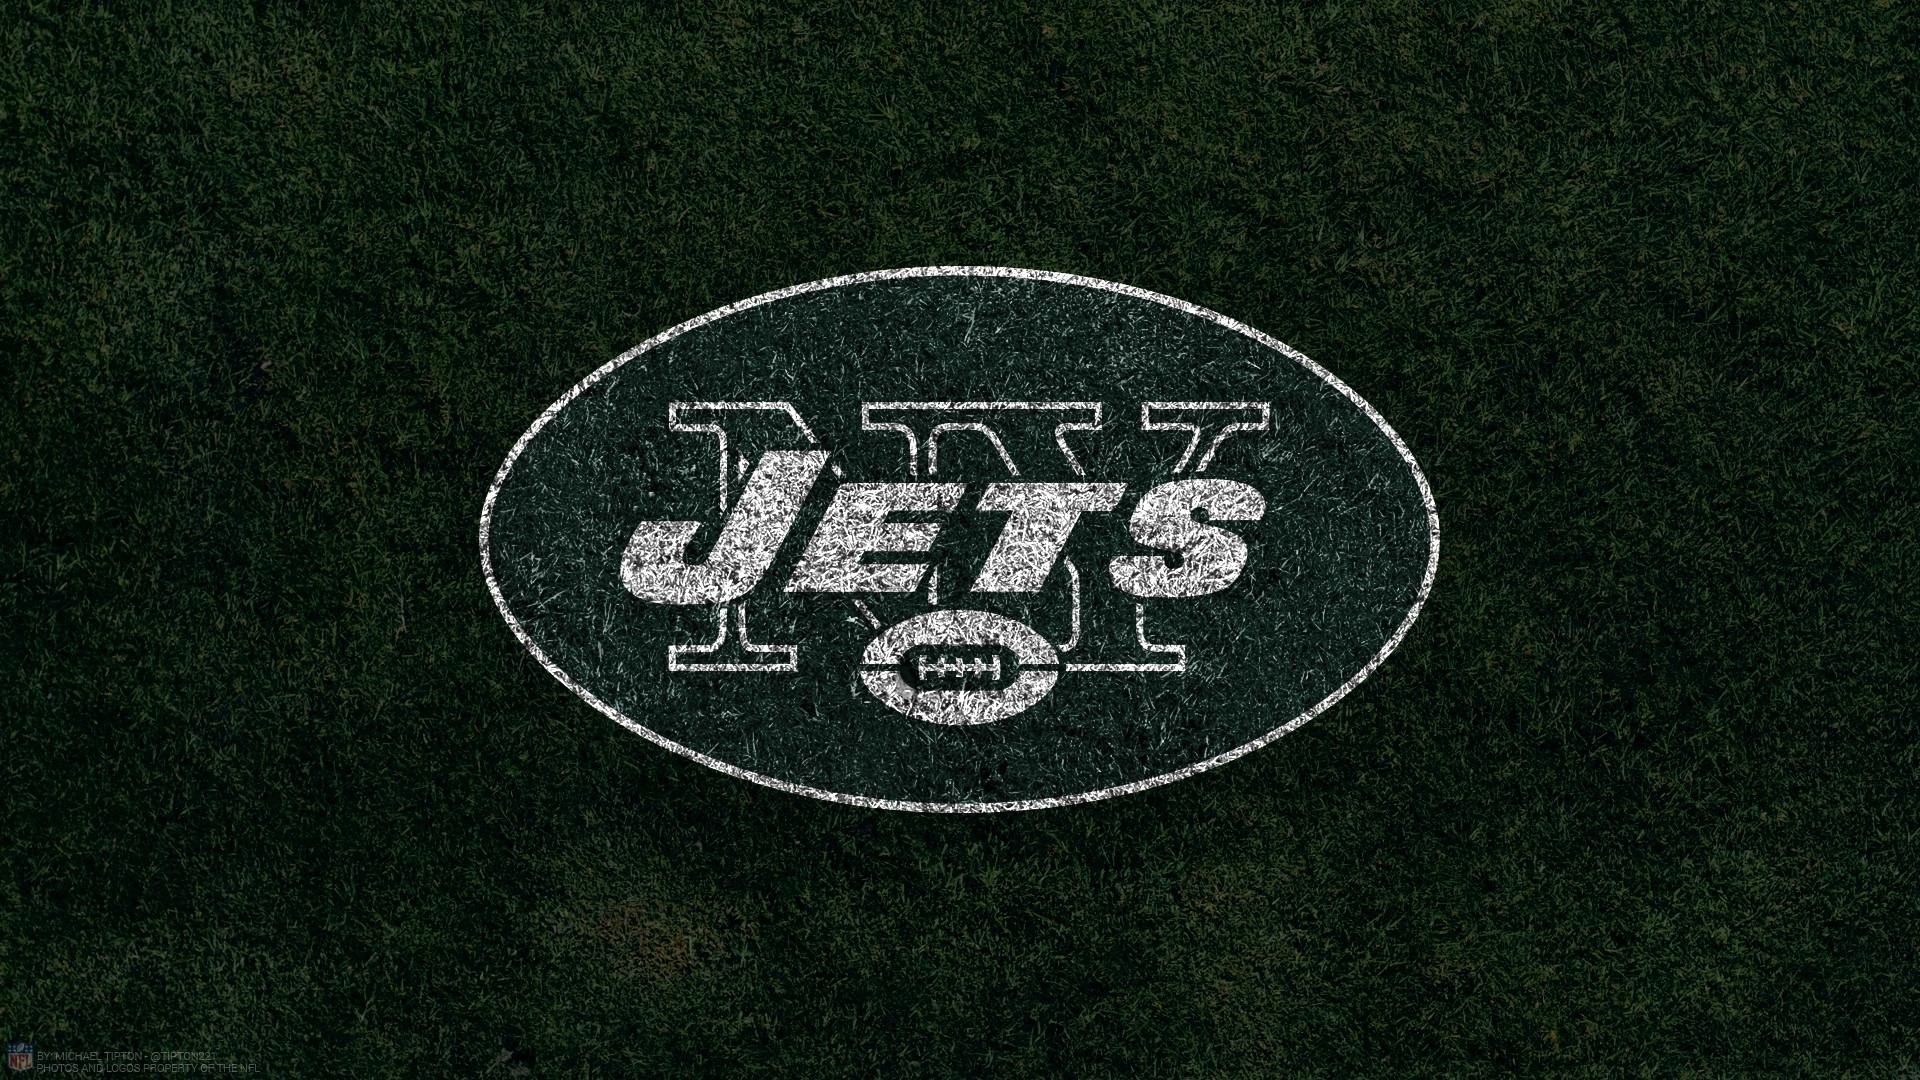 ny jets logo wallpaper (67+ images)